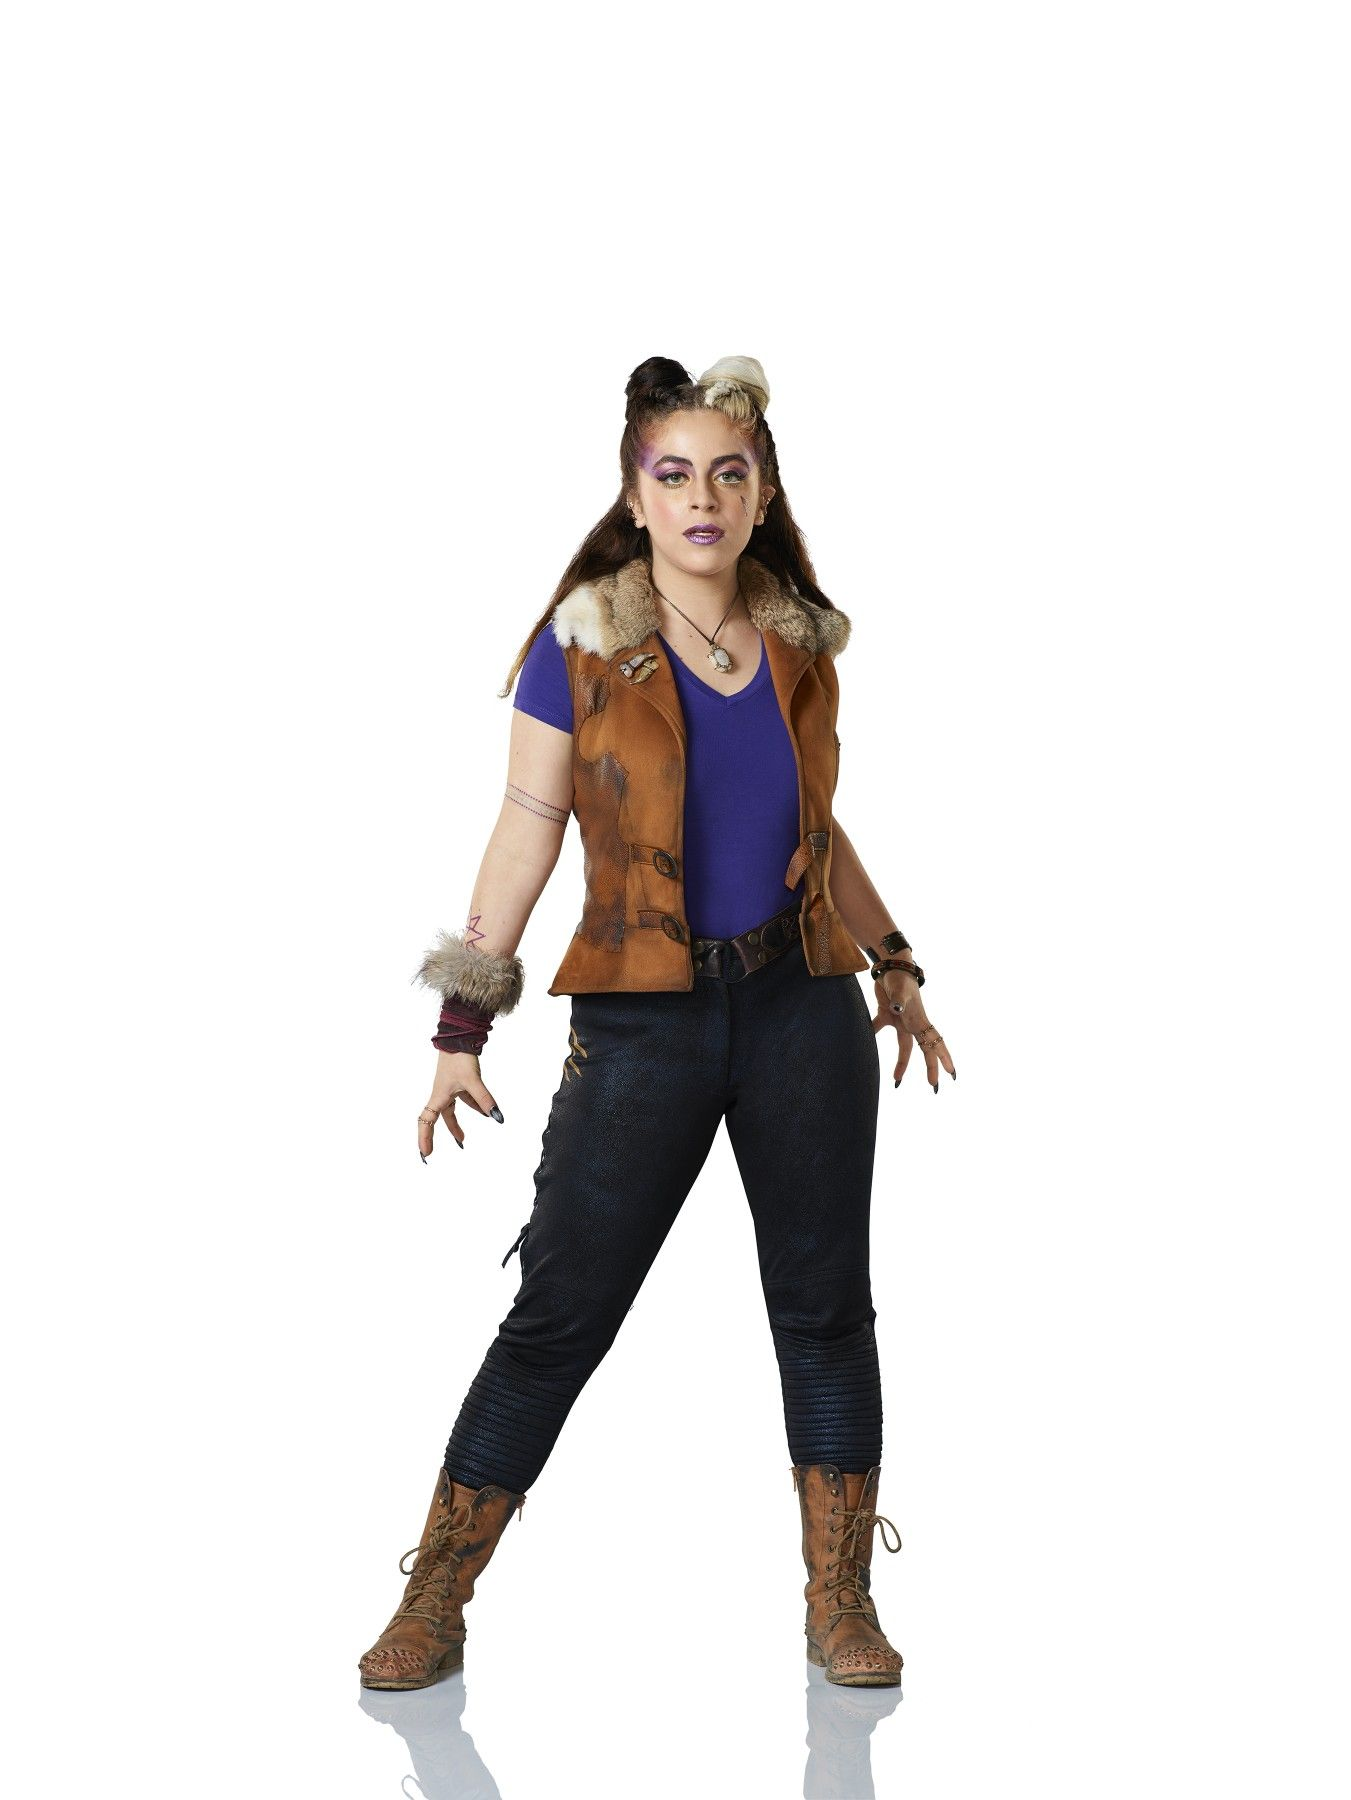 Zombie 2 Image By Sabrina Jordan In 2020 Zombie Disney